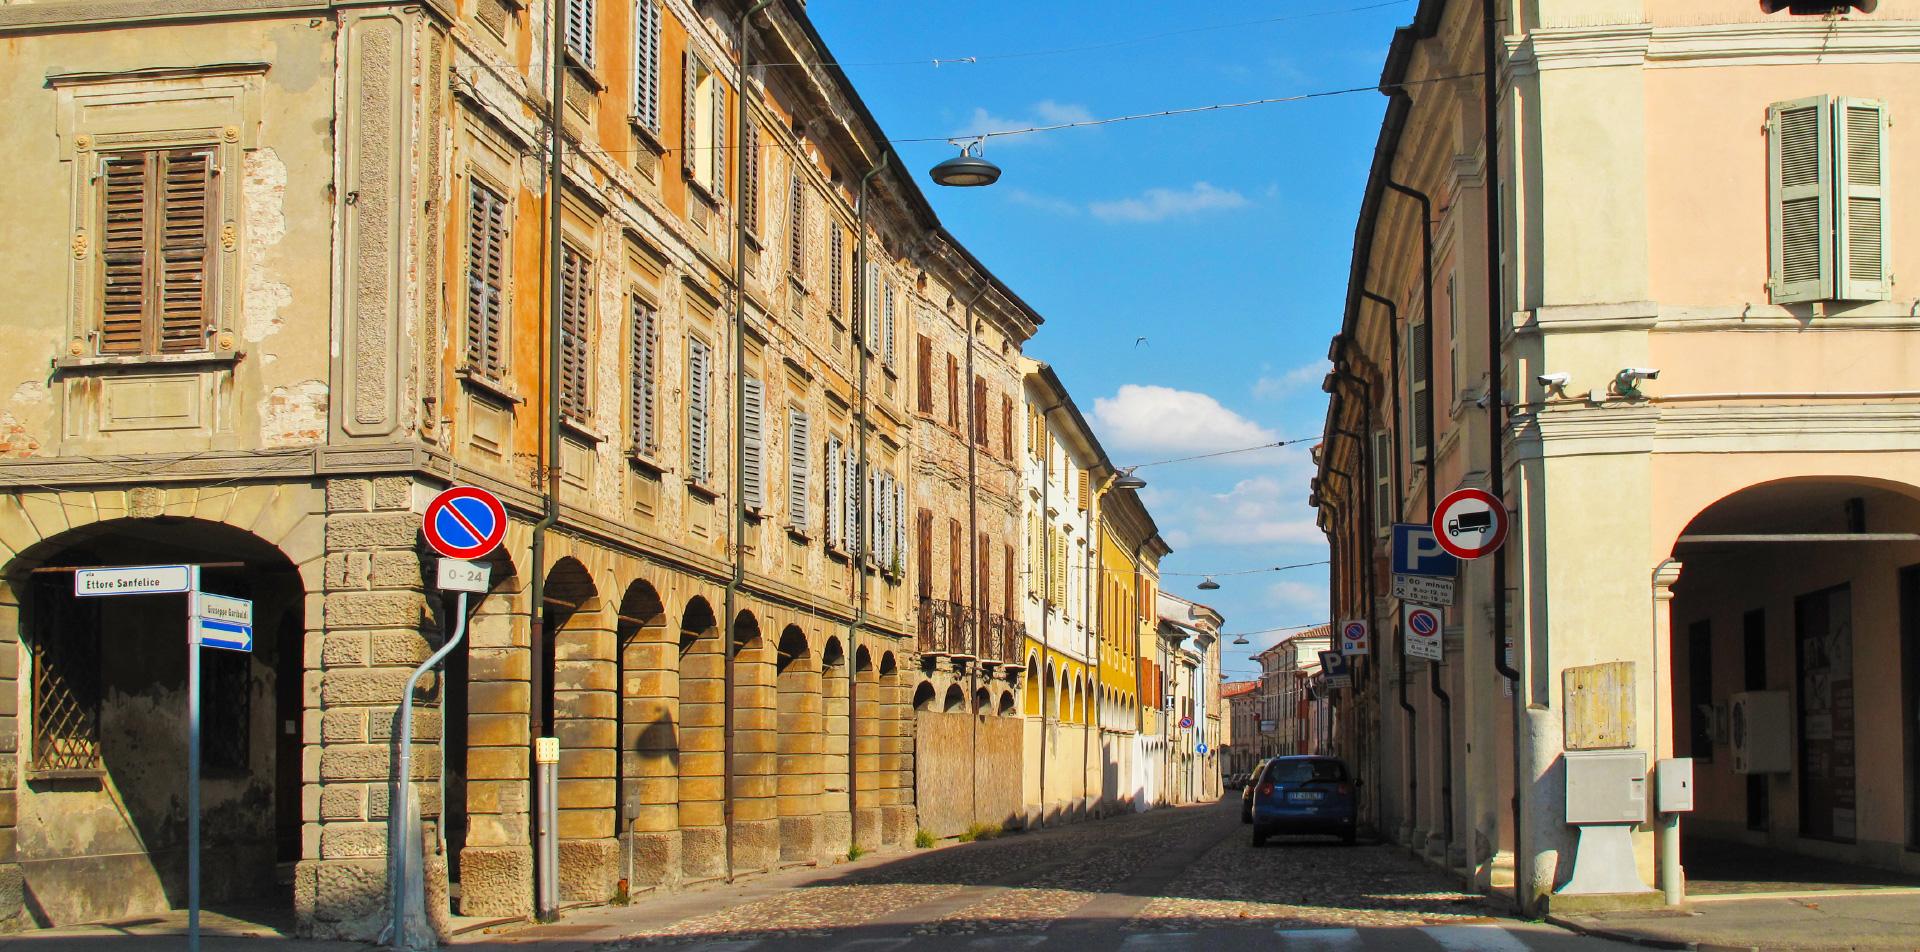 Proloco Viadana - Viadana Borgo